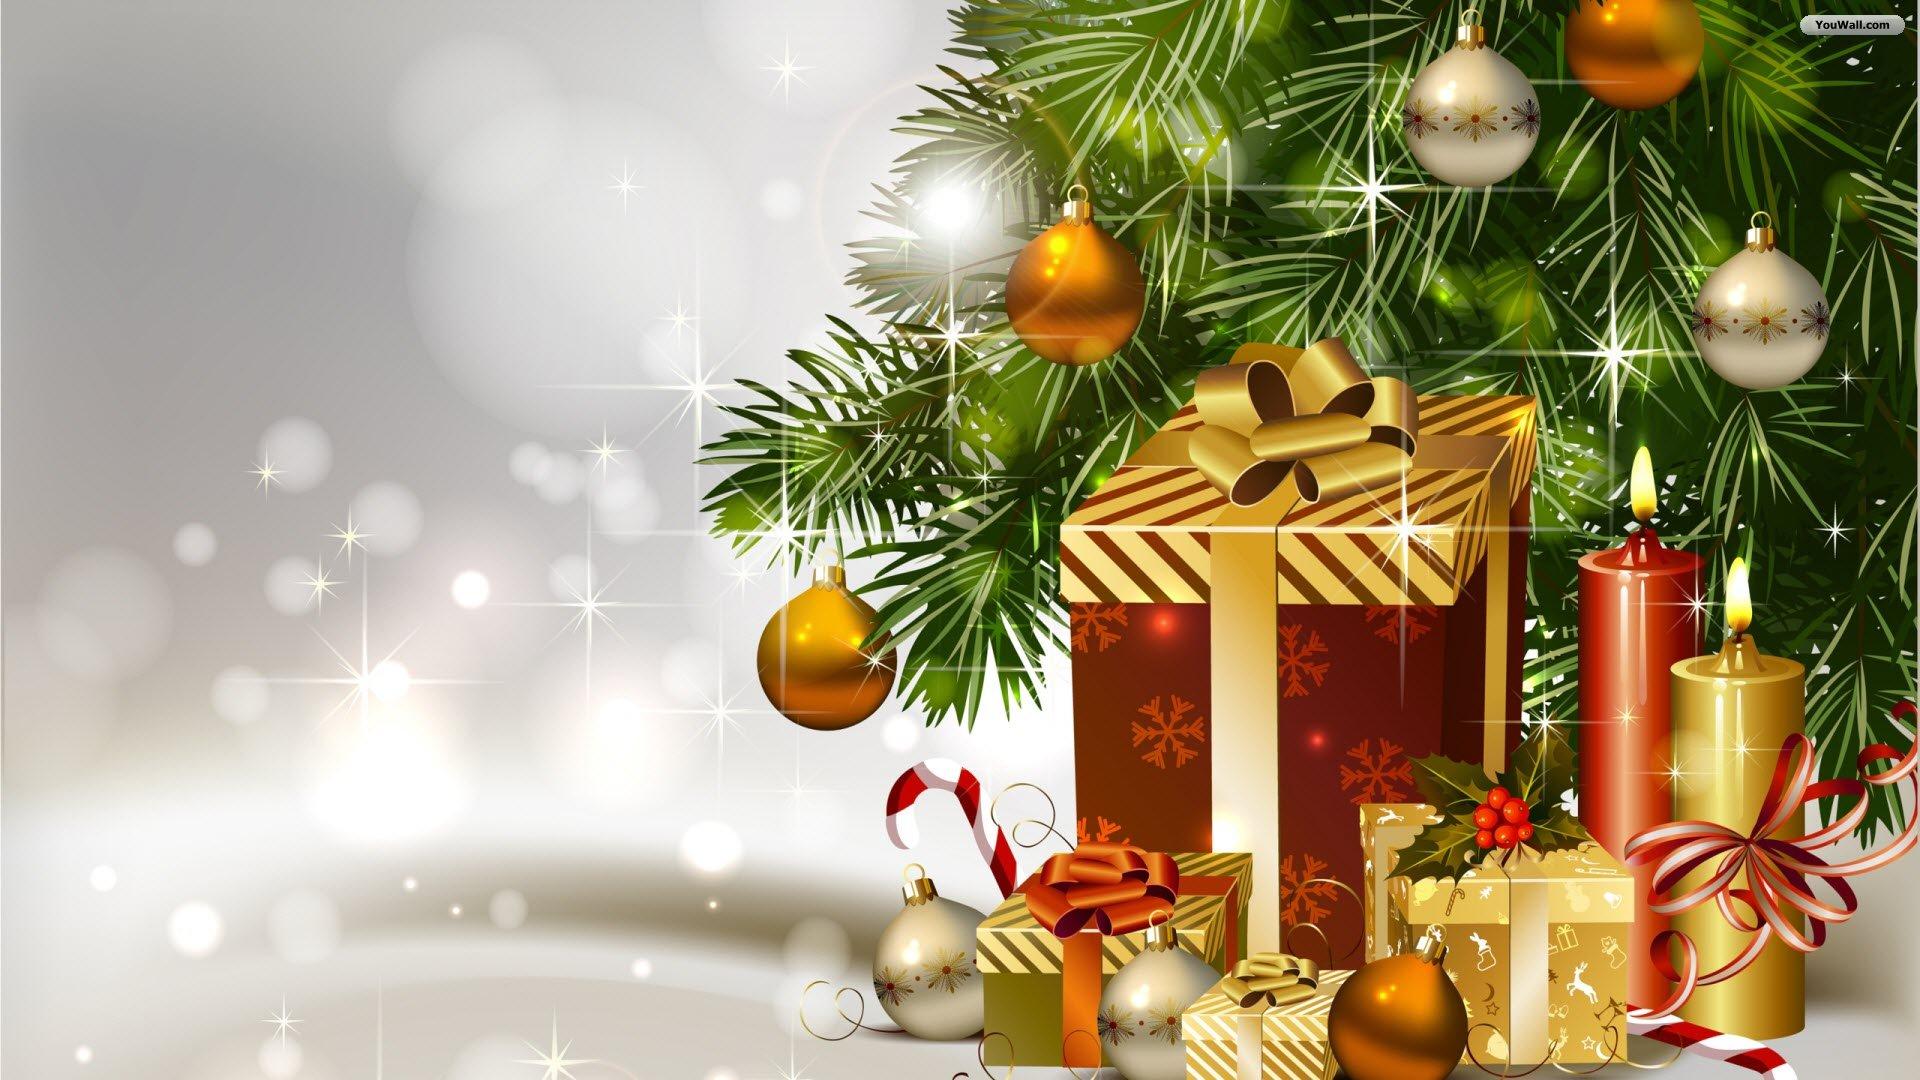 ... Christmas Tree Wallpaper 03 ...